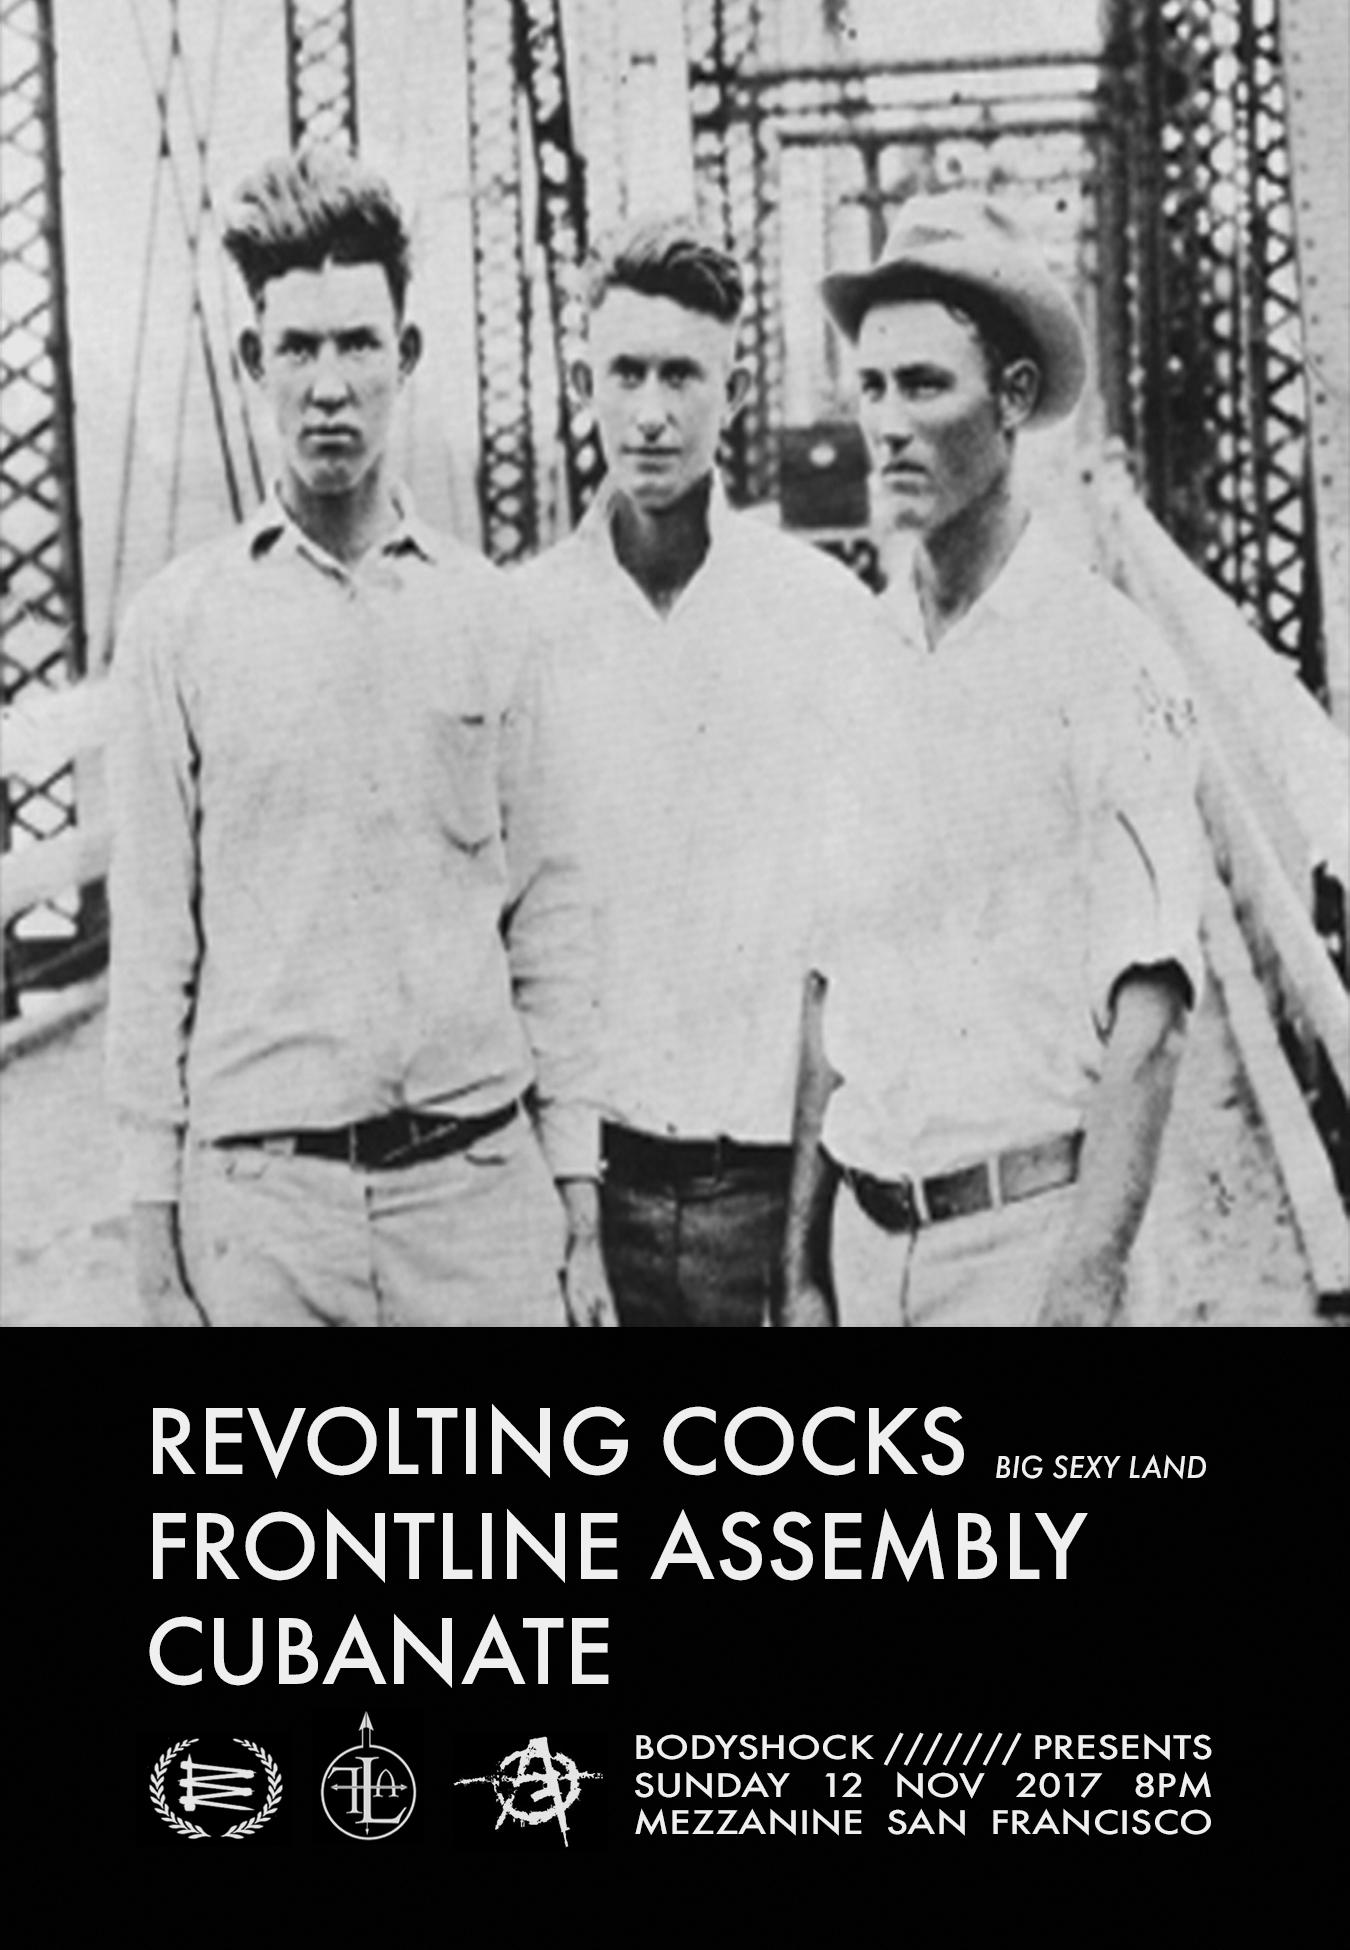 REVOLTING COCKS at MEZZANINE presented by BODYSHOCK